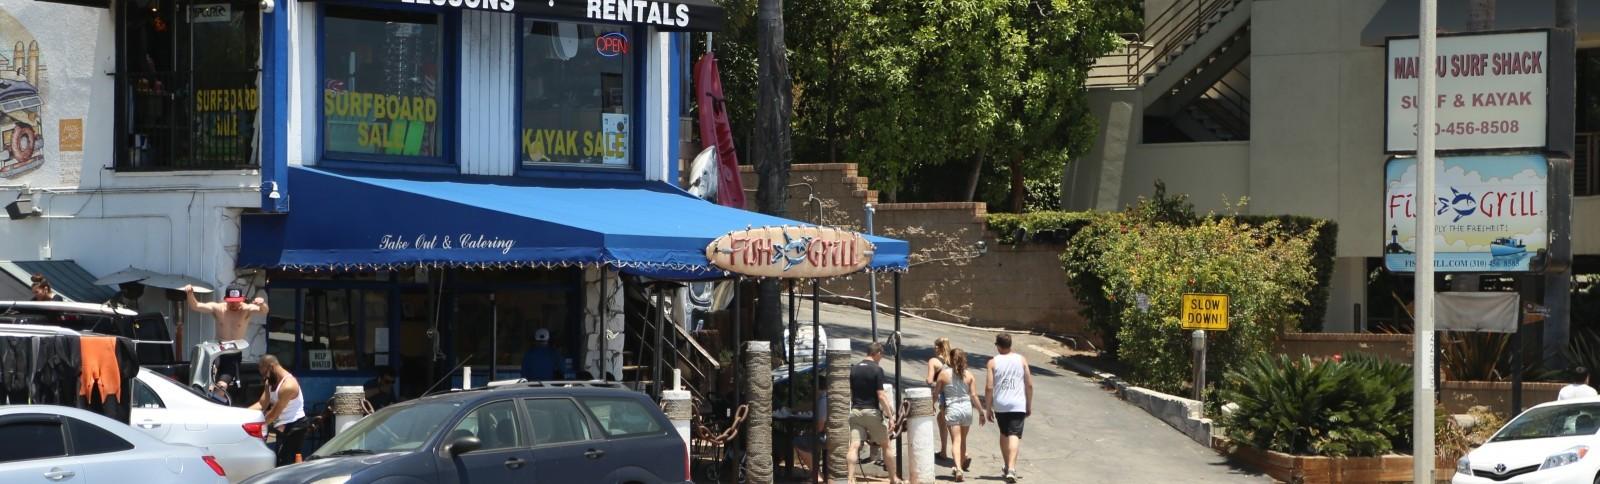 fish-grill-restaurant_all-things-malibu